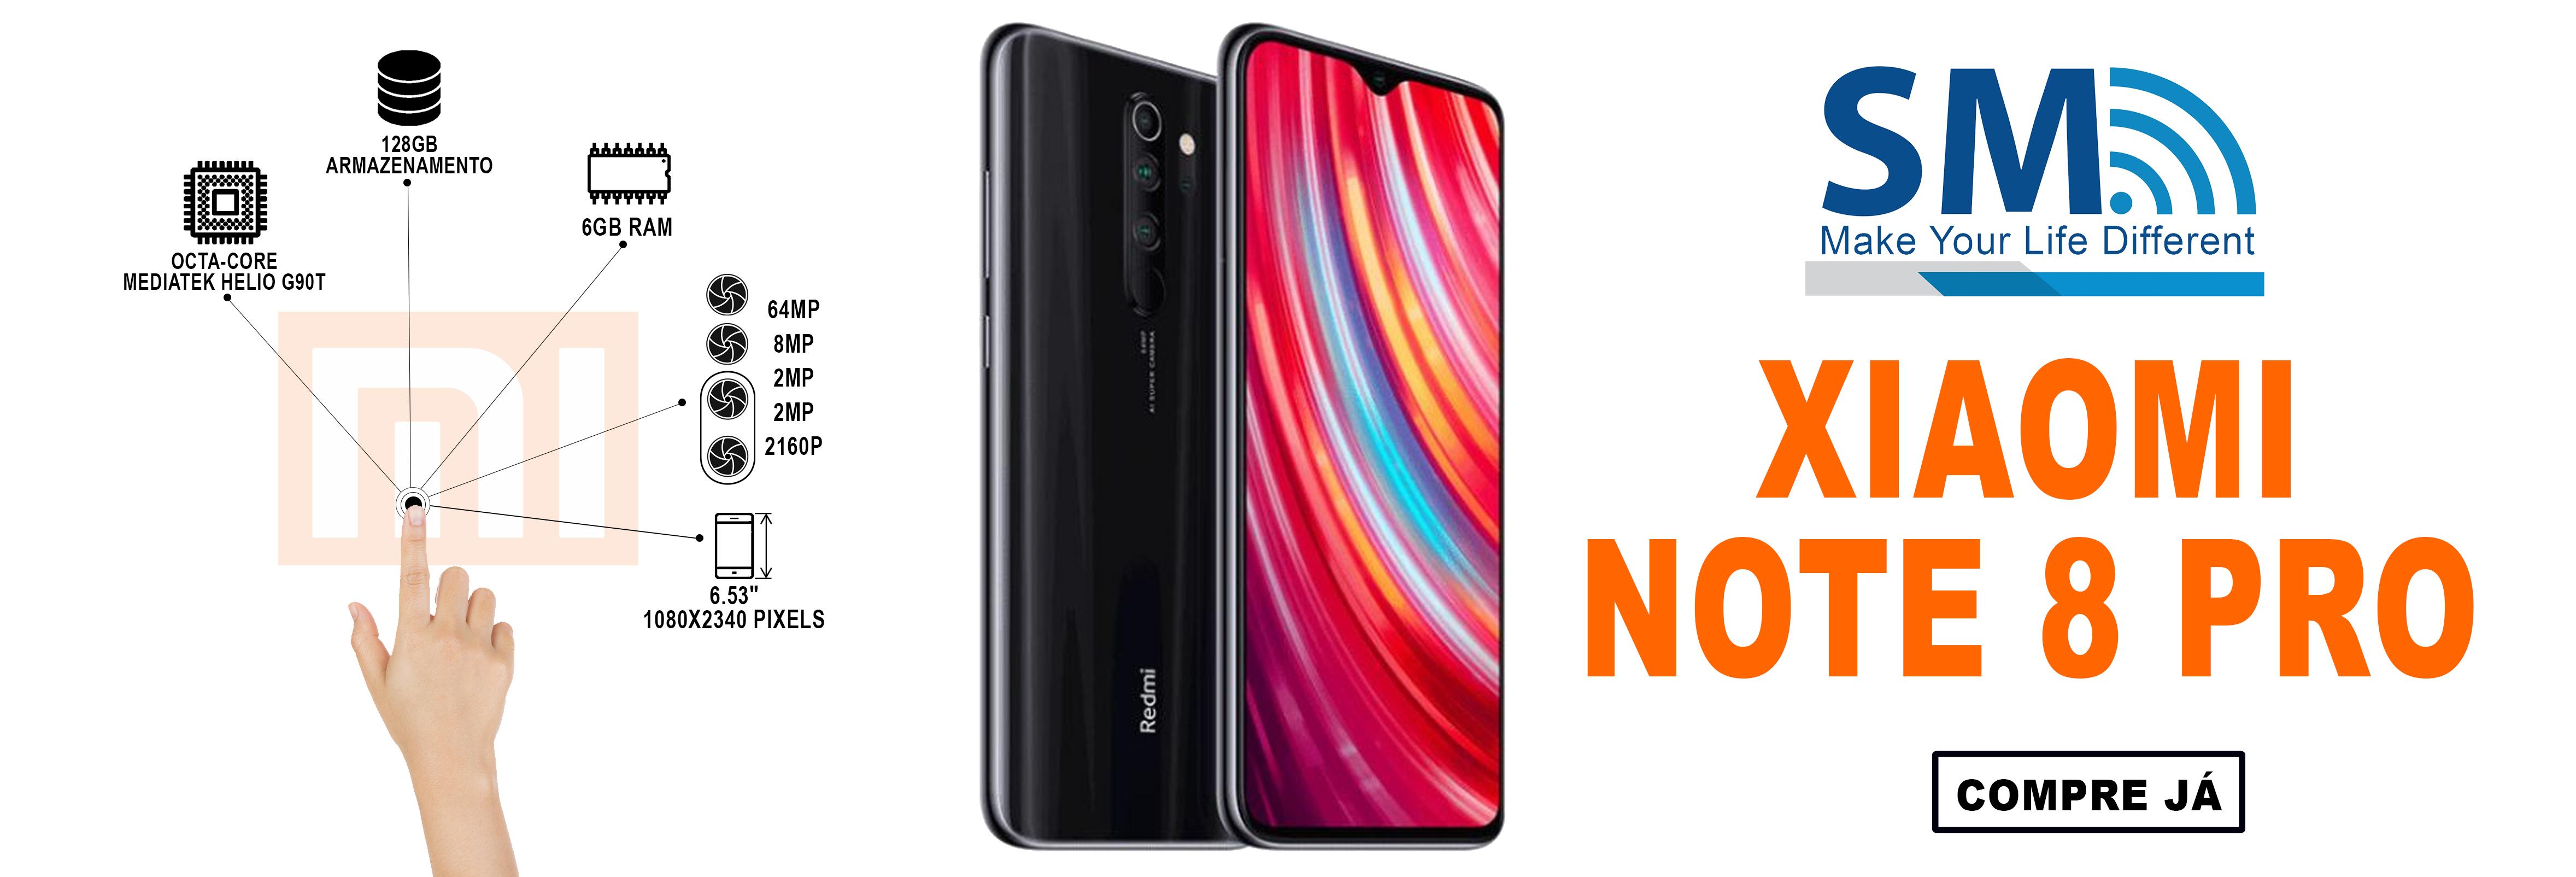 Xiaomi Redmi Note 8 Pro Dual SIM 6GB/64GB Black